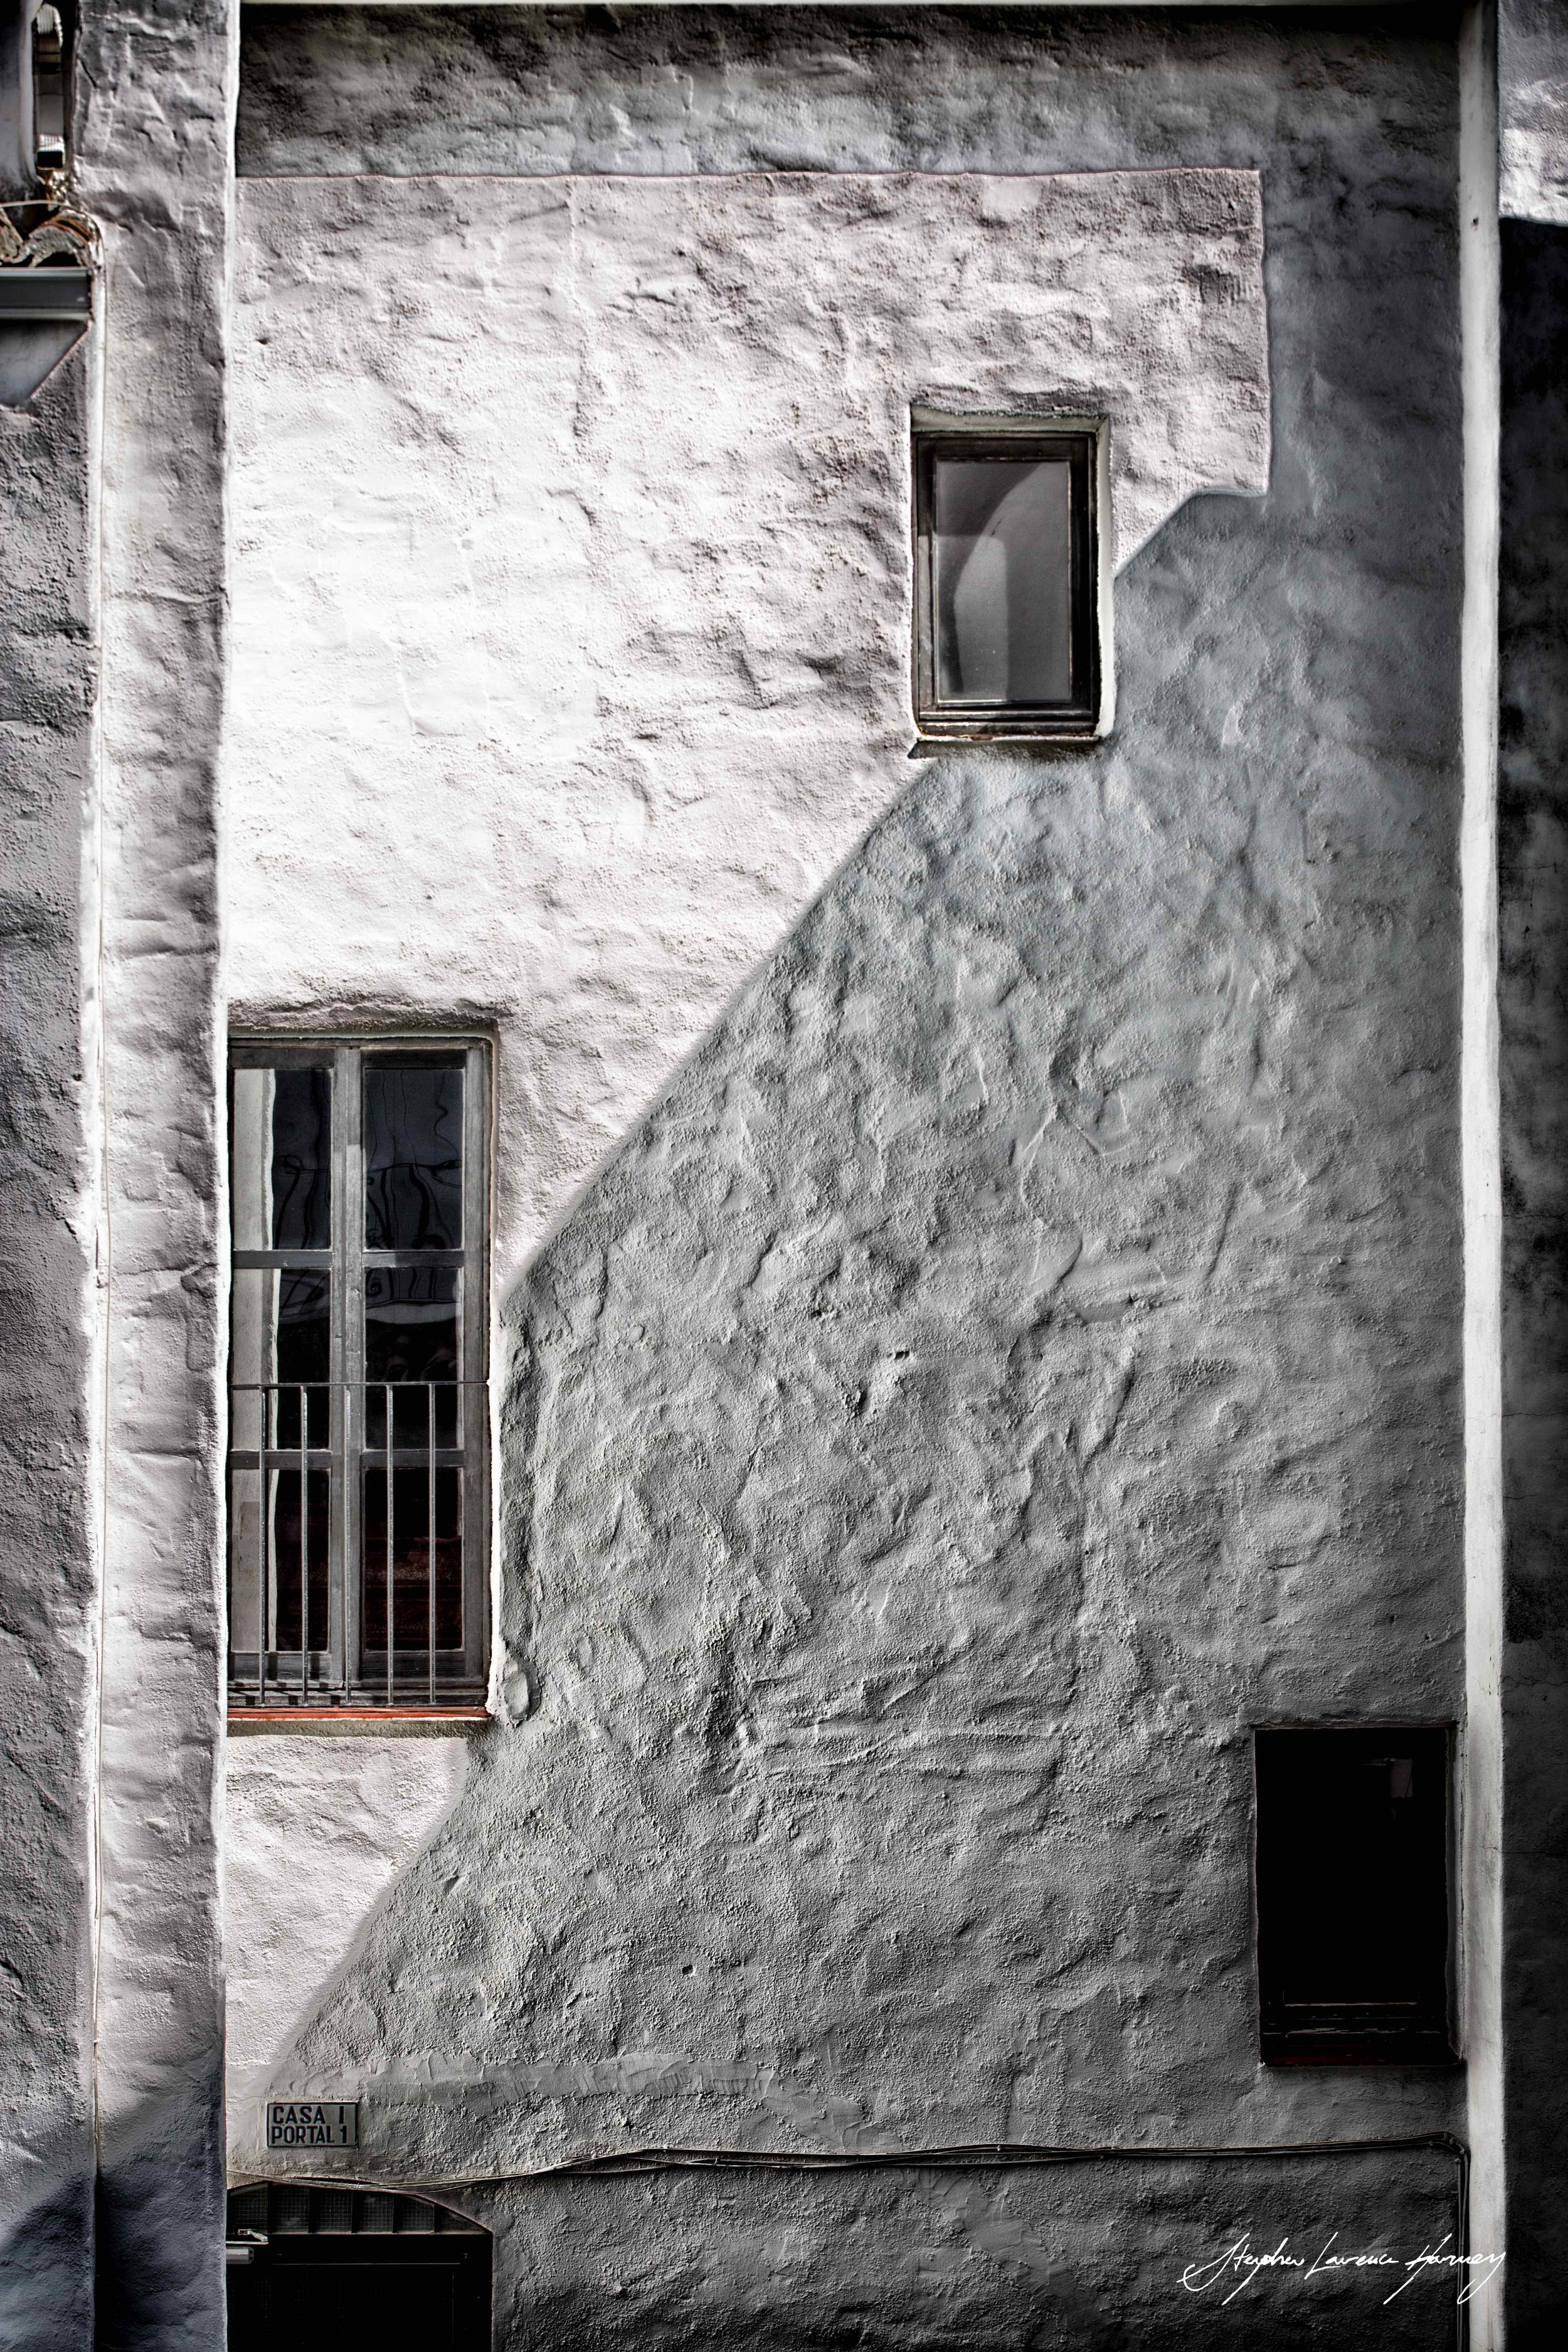 Marbella wall (1 of 1) copy.jpg